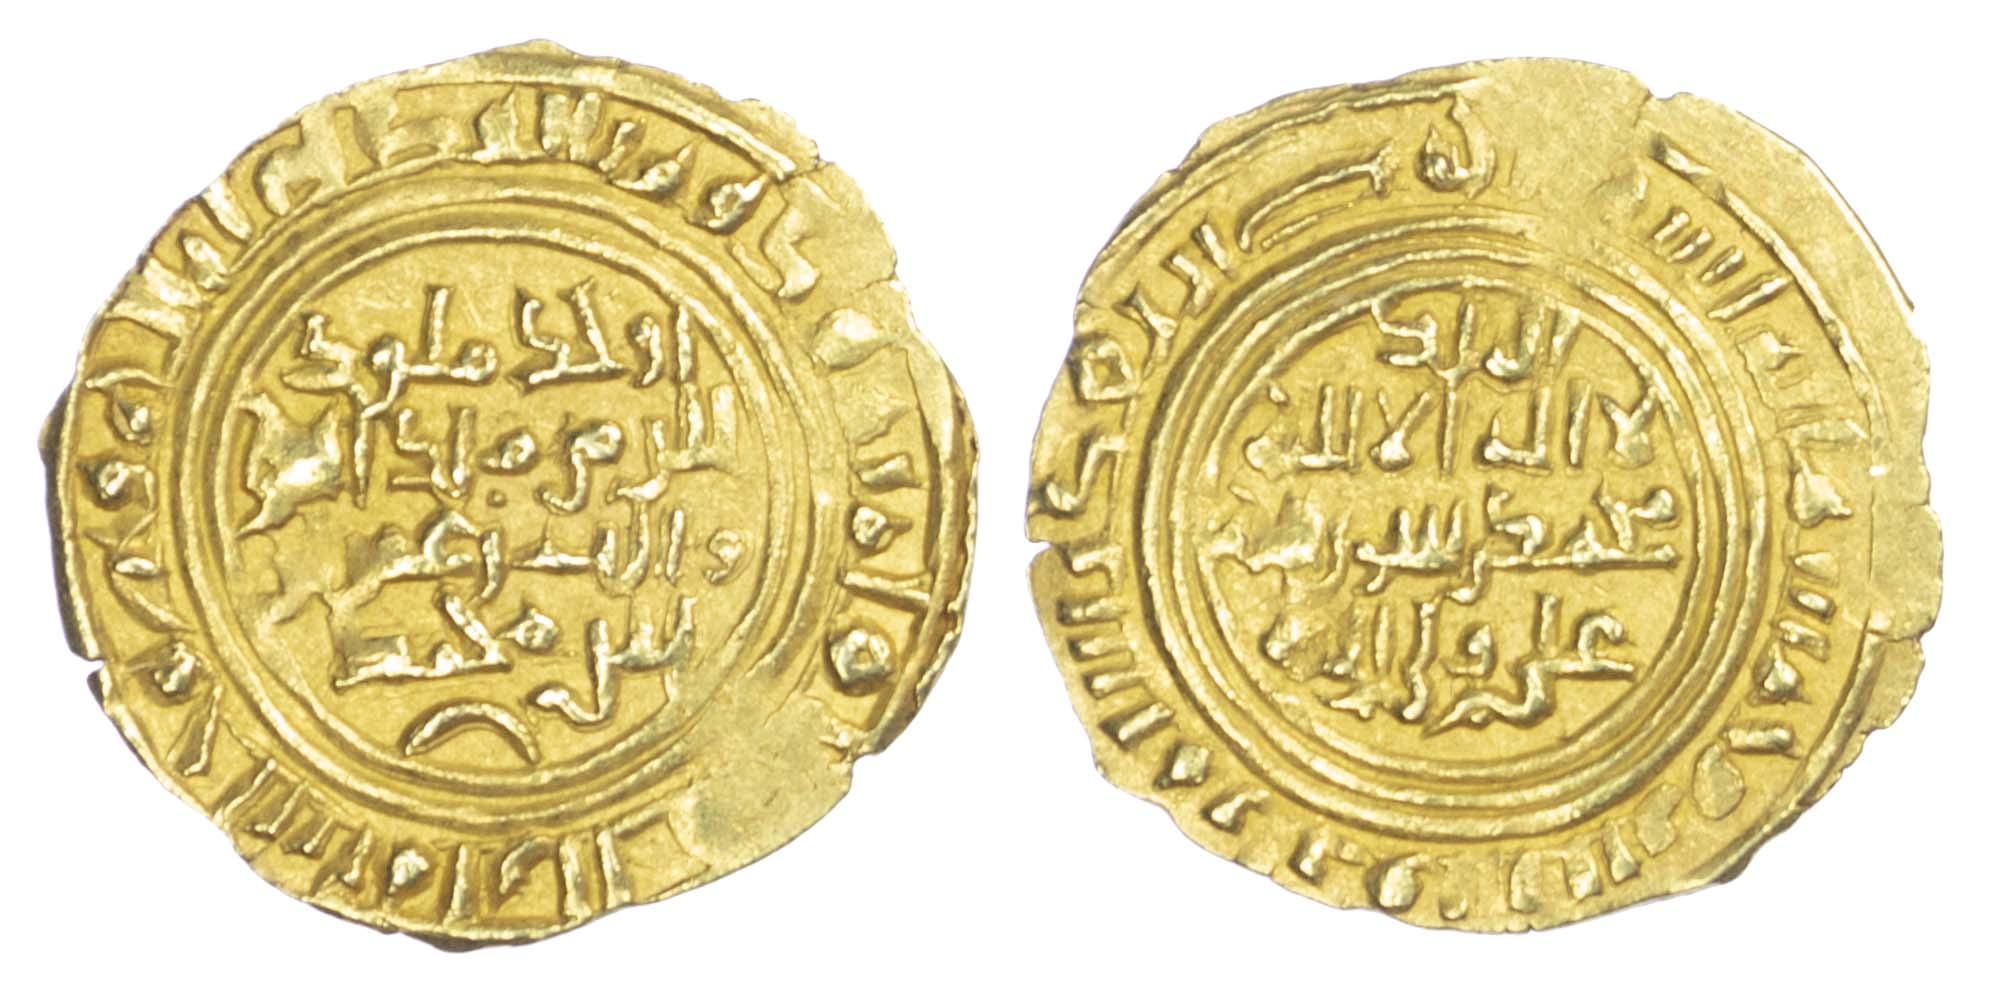 ZURAY'ID, IMRAN B. MUHAMMAD, POSTHUMOUS GOLD DINAR (563H/1168 AD) – RARE